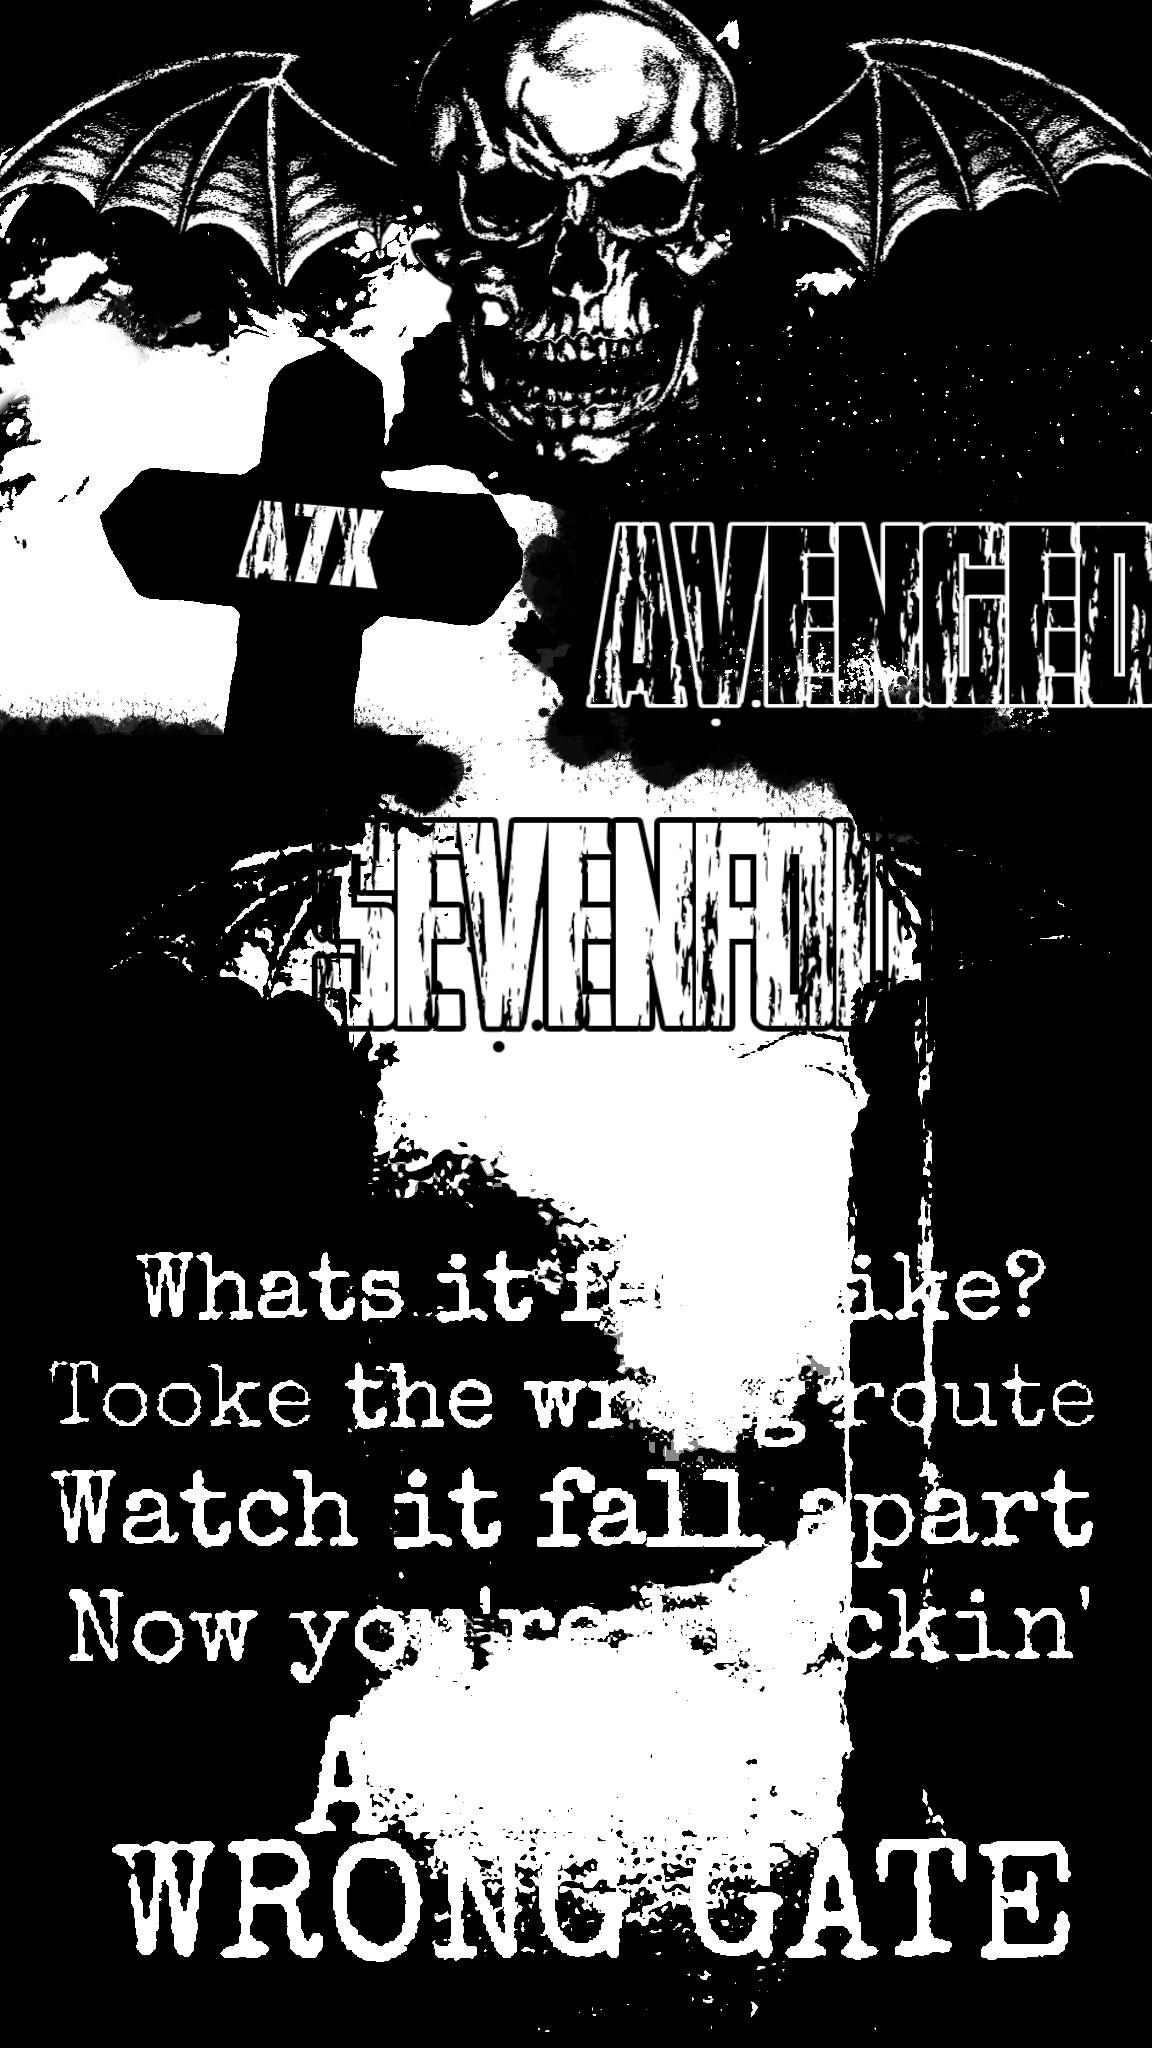 a7x avenged sevenfold rock